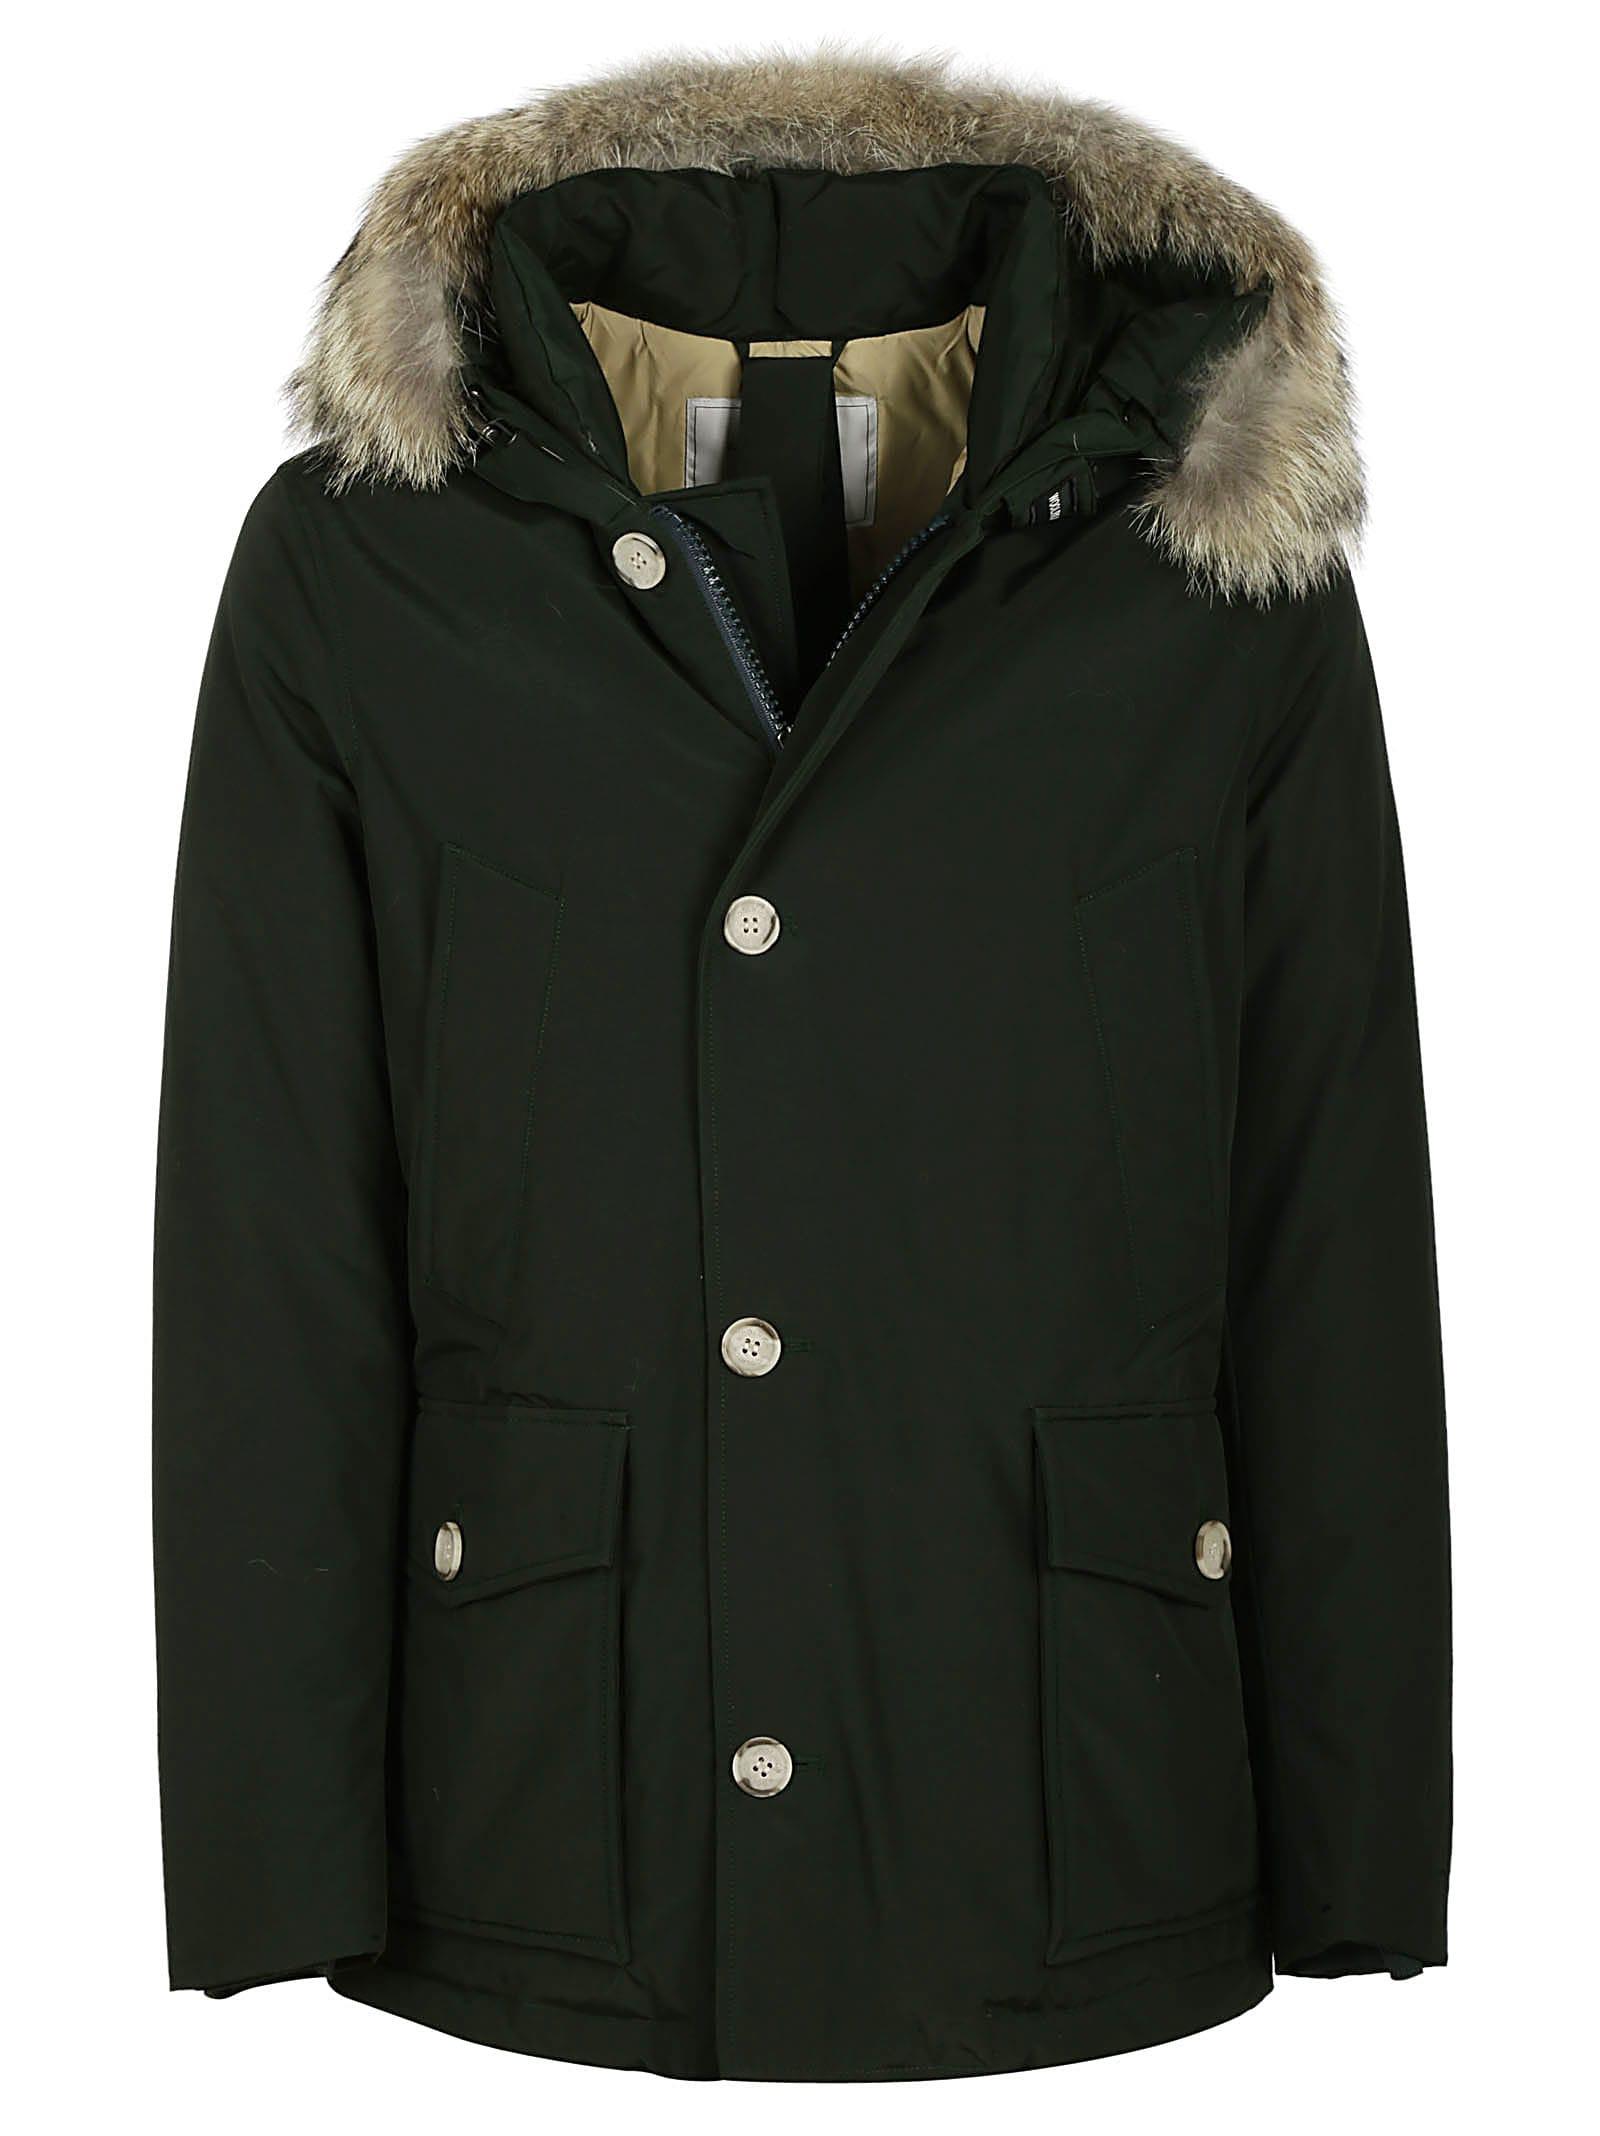 black parka jacket with fur hood